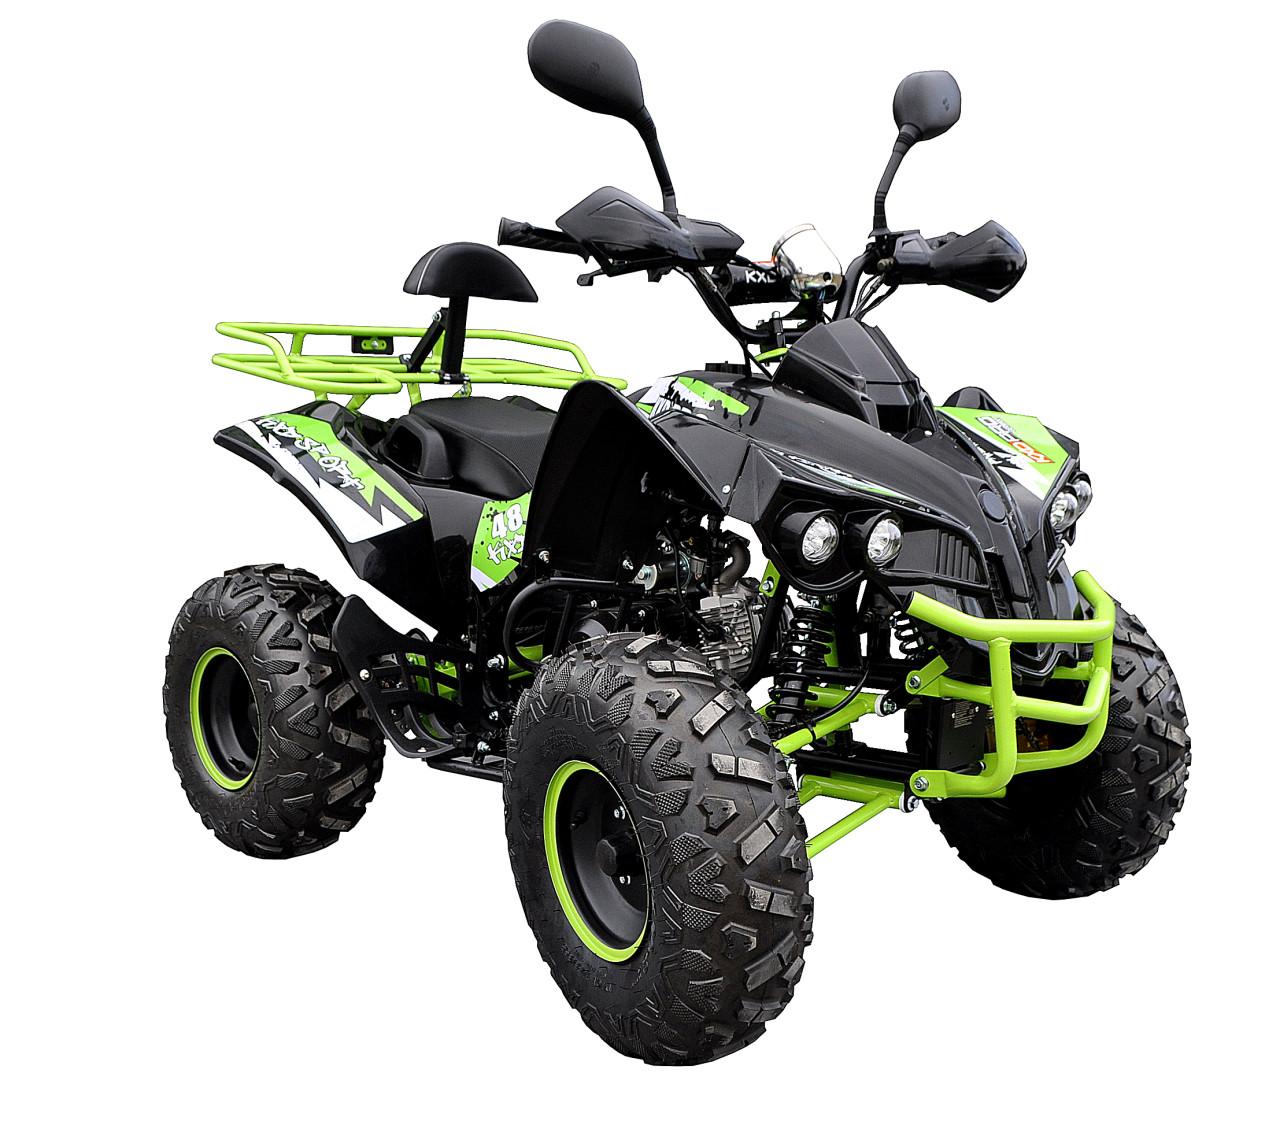 ATV BEMI RO 125 Renegade R8 NOI 0Km semi-aurtomatic PRET REAL !